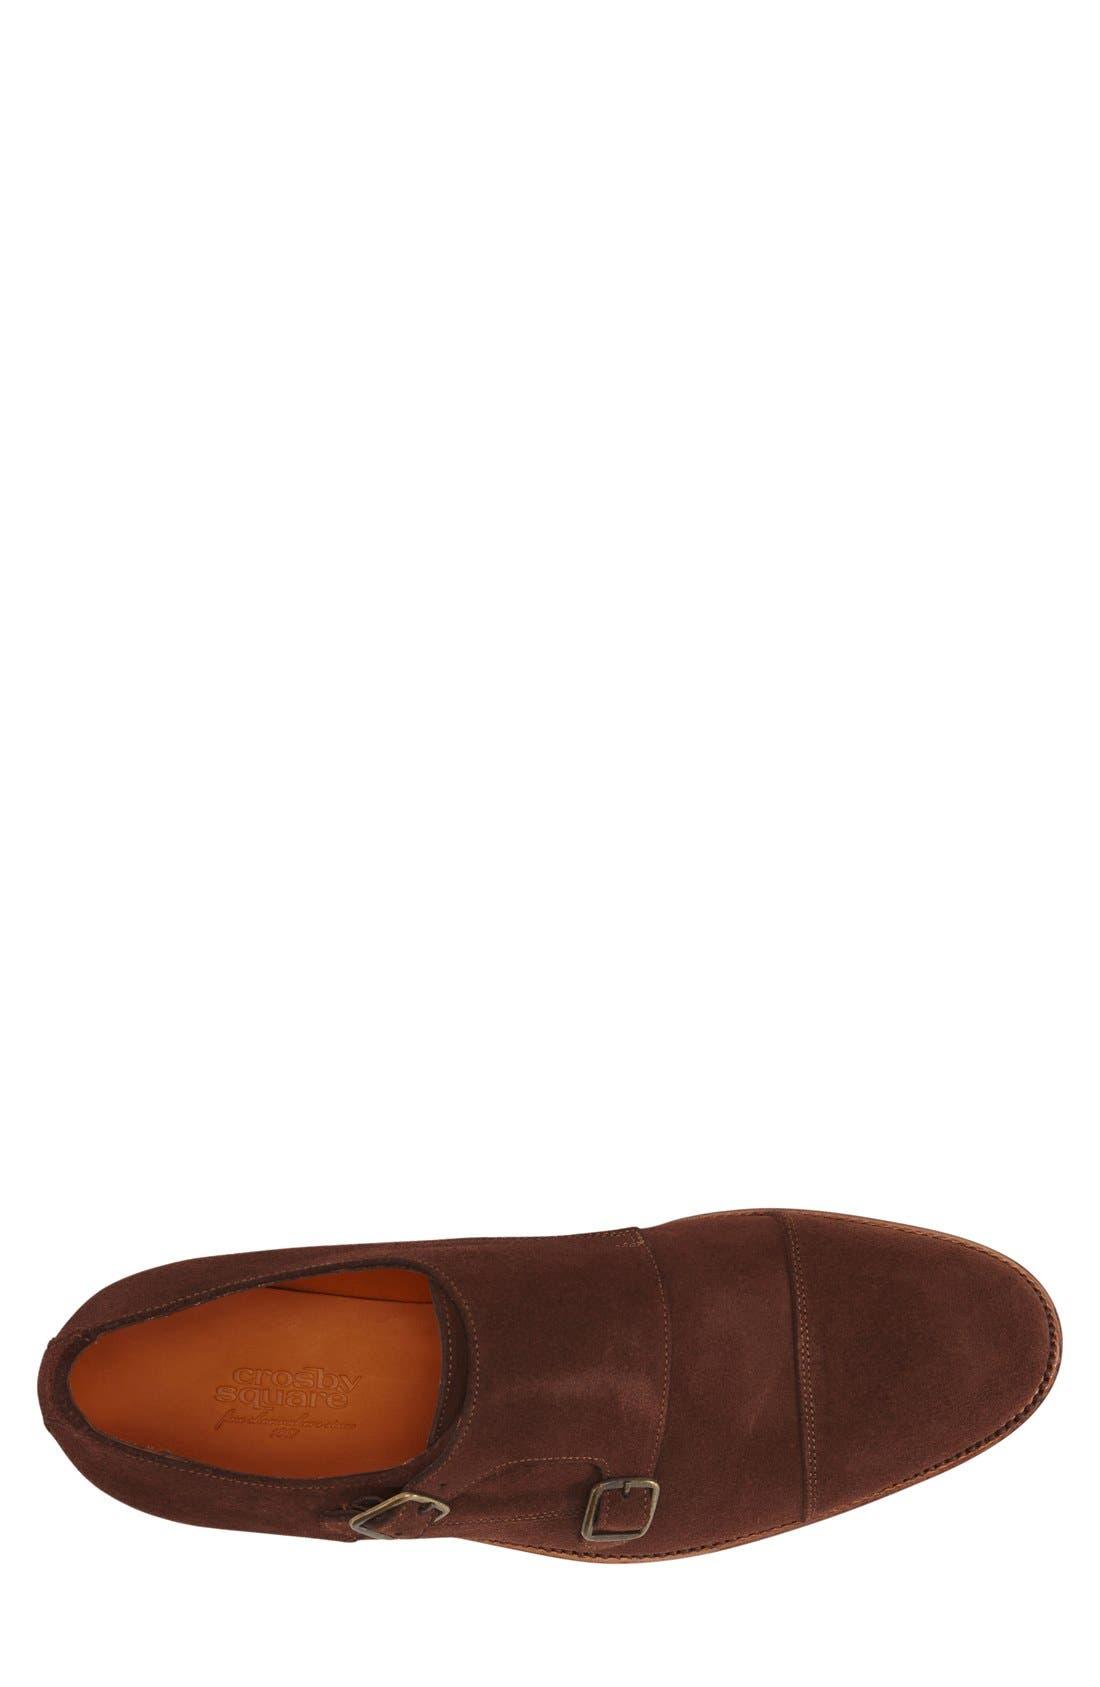 Alternate Image 3  - Crosby Square 'Diplomat' Double Monk Strap Shoe (Men)